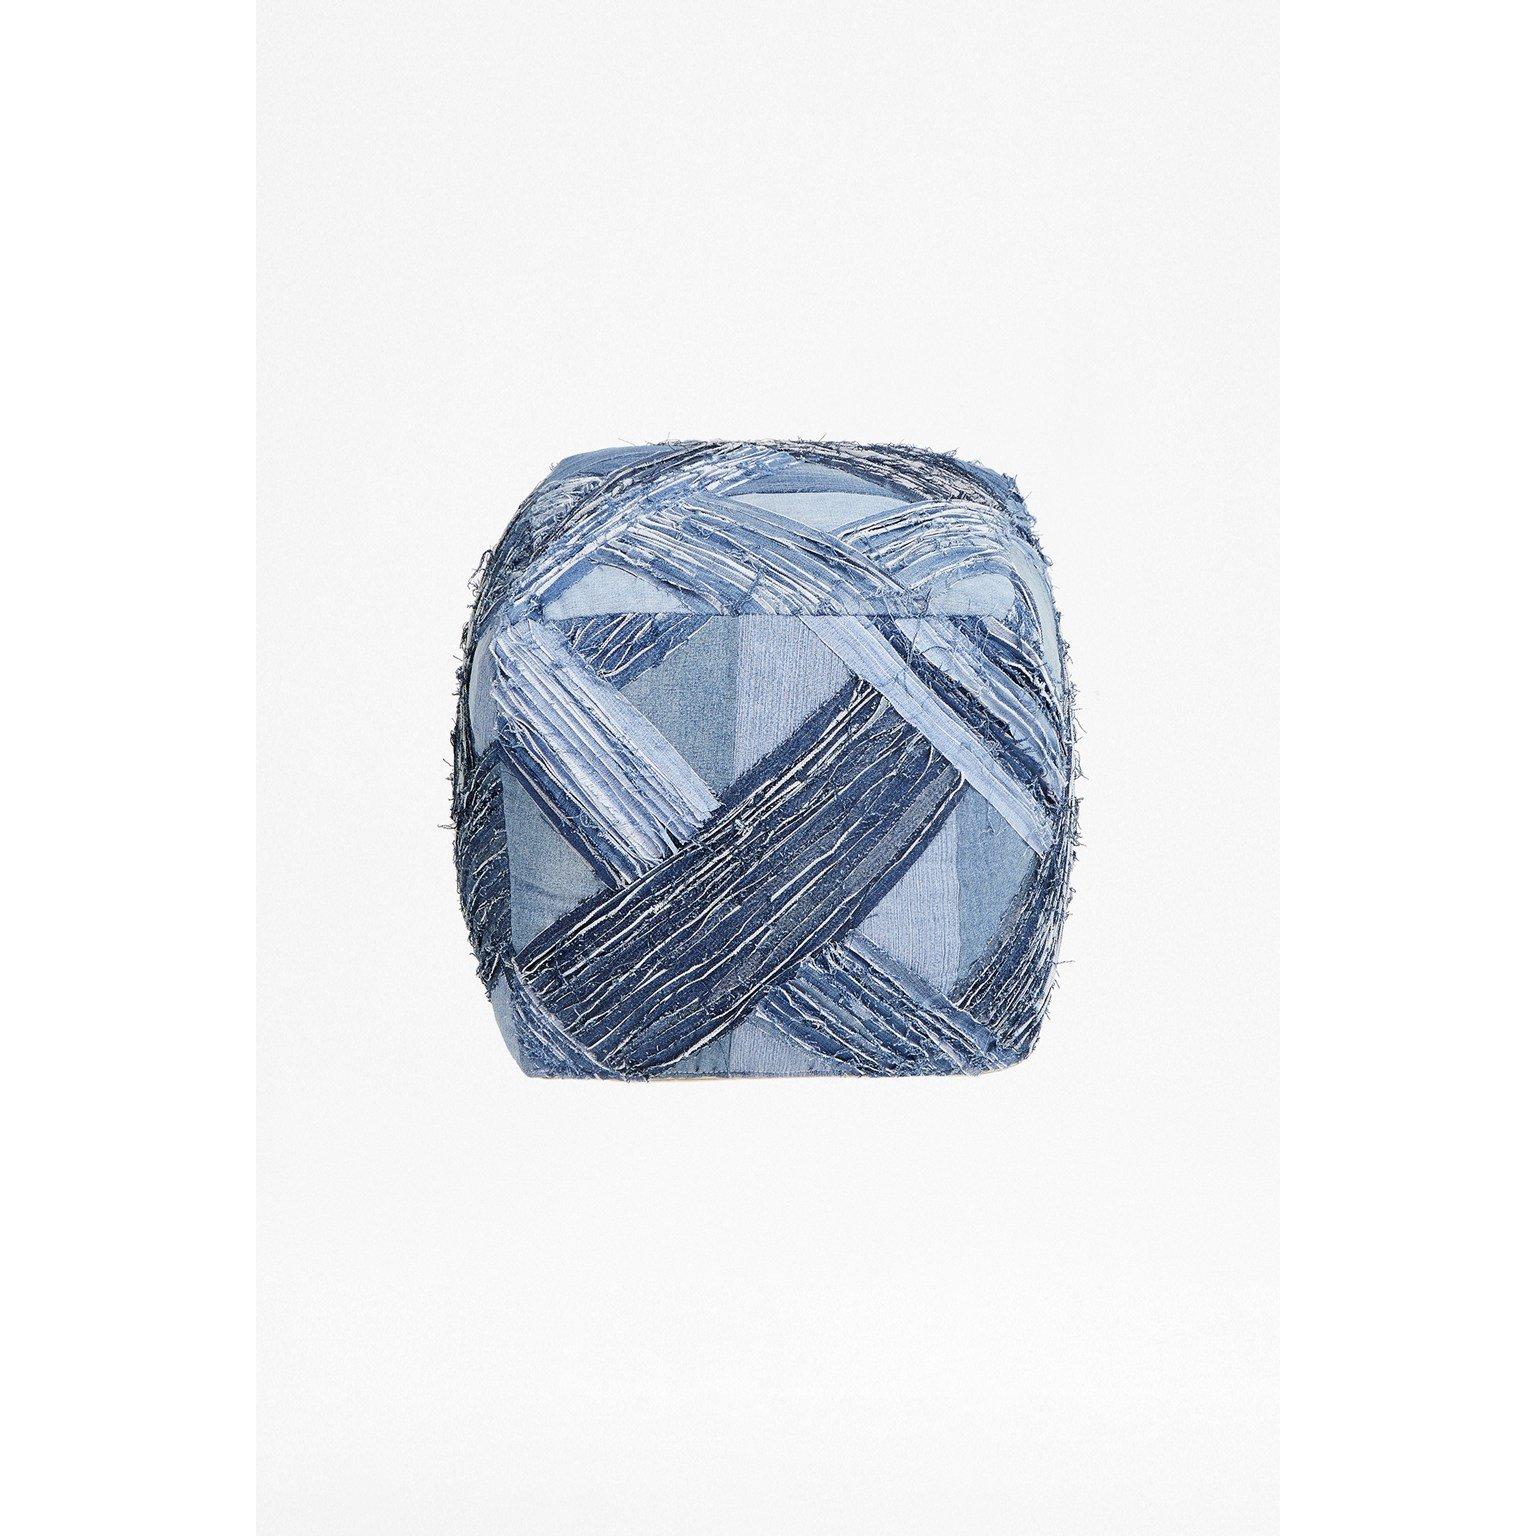 image-Recycled Denim Pouffe - blue denim